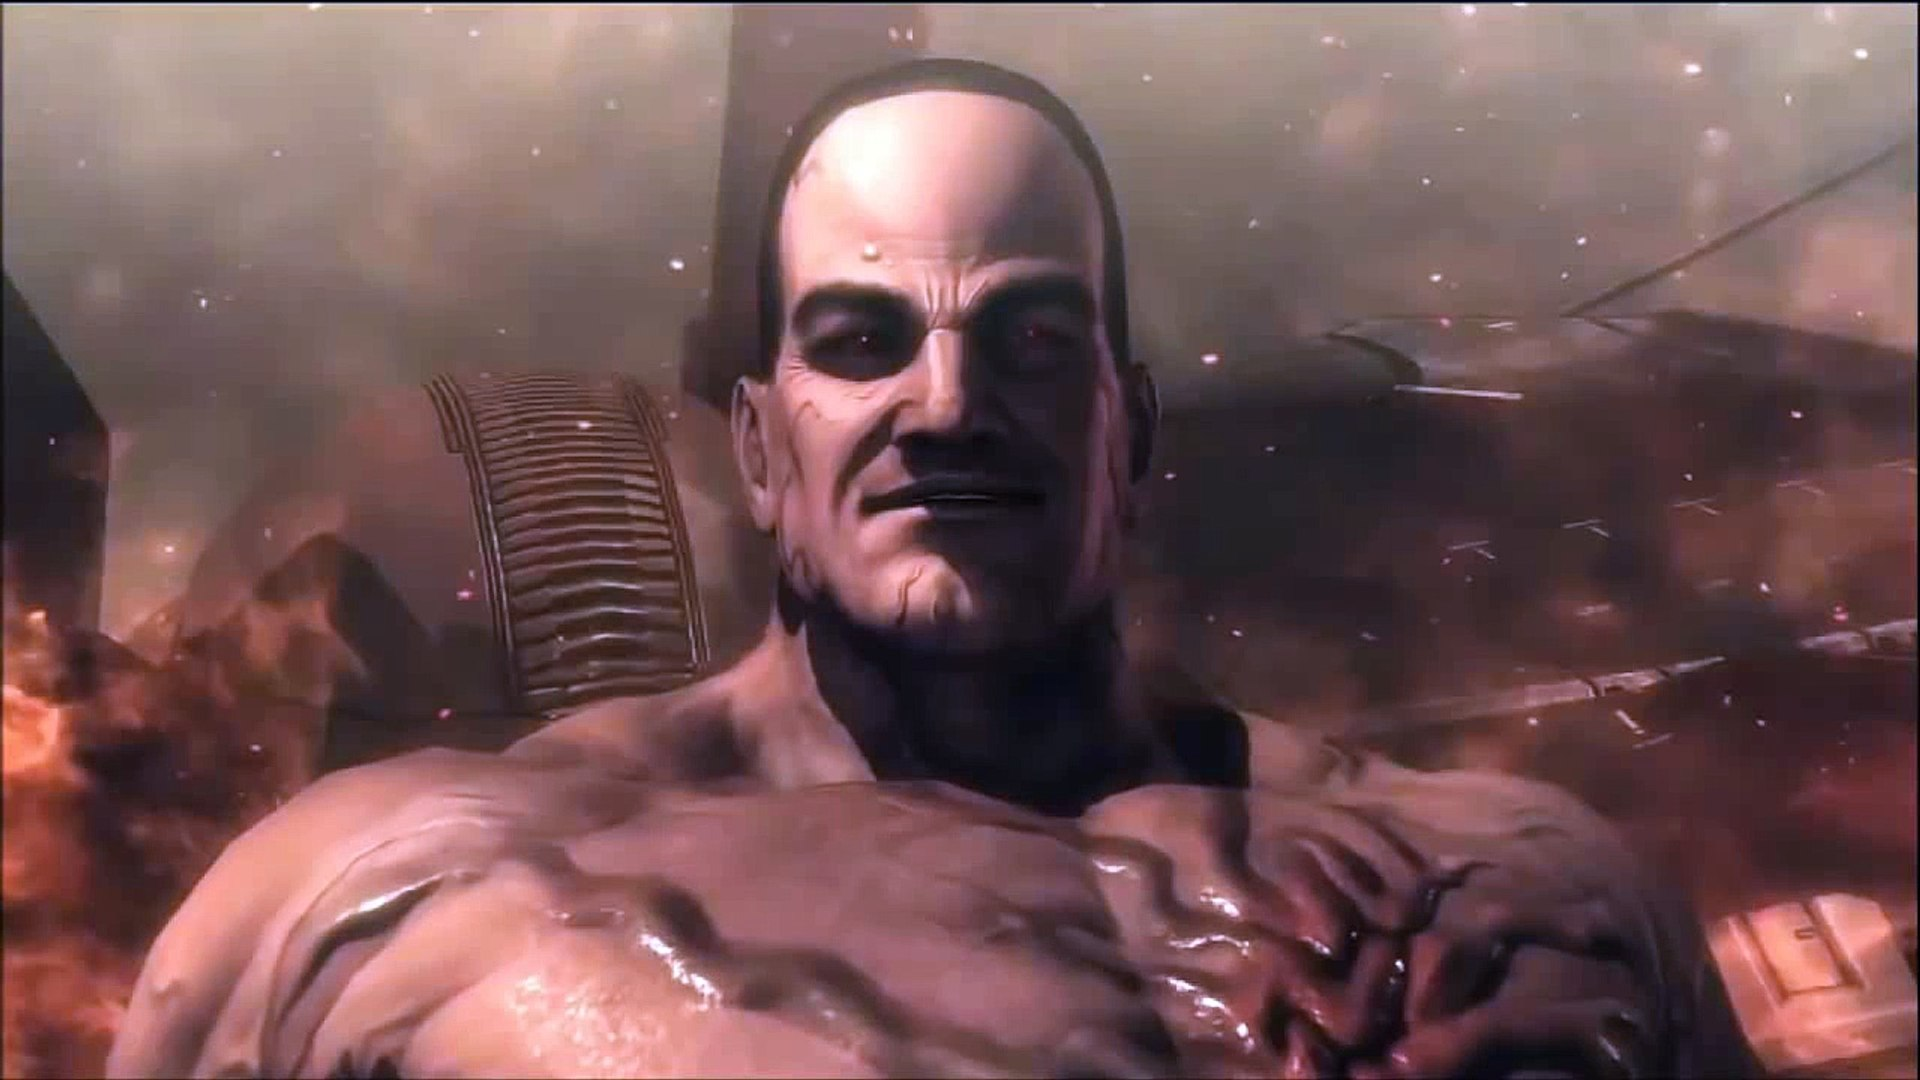 [8 BIT VERSION] Bloodstained Sand (metal gear rising final boss theme)